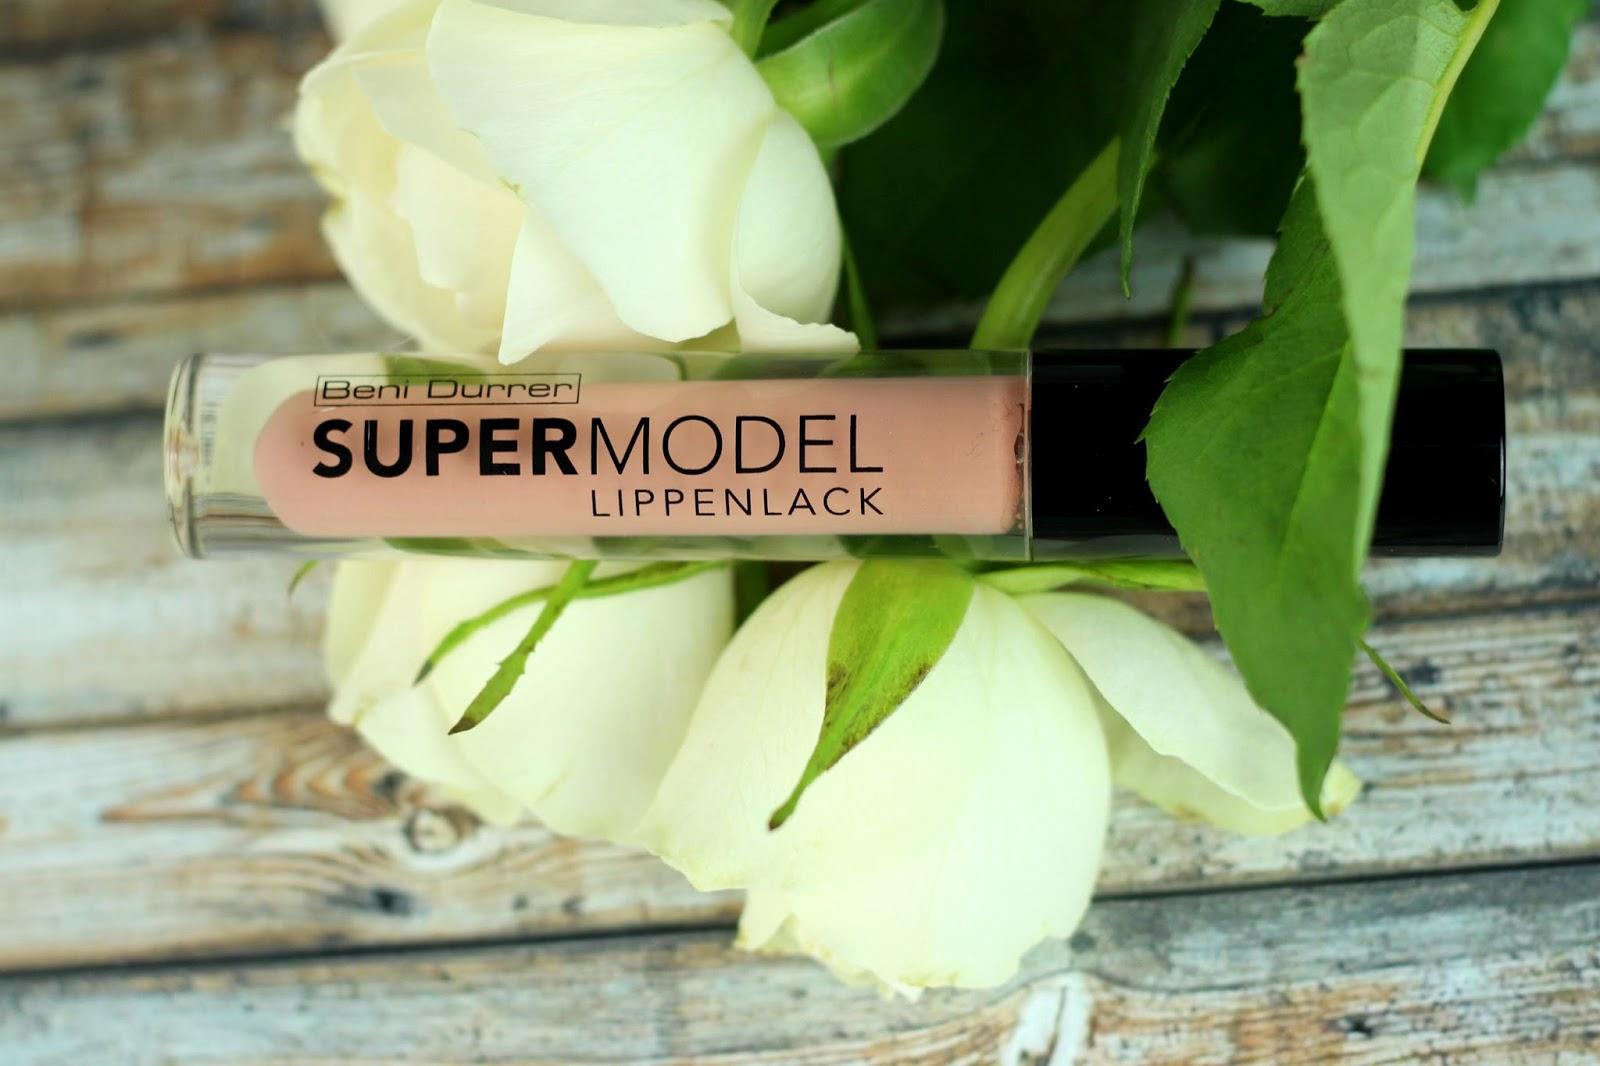 beni durrer, blogger club, blush, eyeshadow, karen, lidschatten, lipgloss, lippenstift, professionelles make-up, review, rosenholz, rouge, samt, sangria, storm, supermodel lippenlack, swatches, tragebilder,